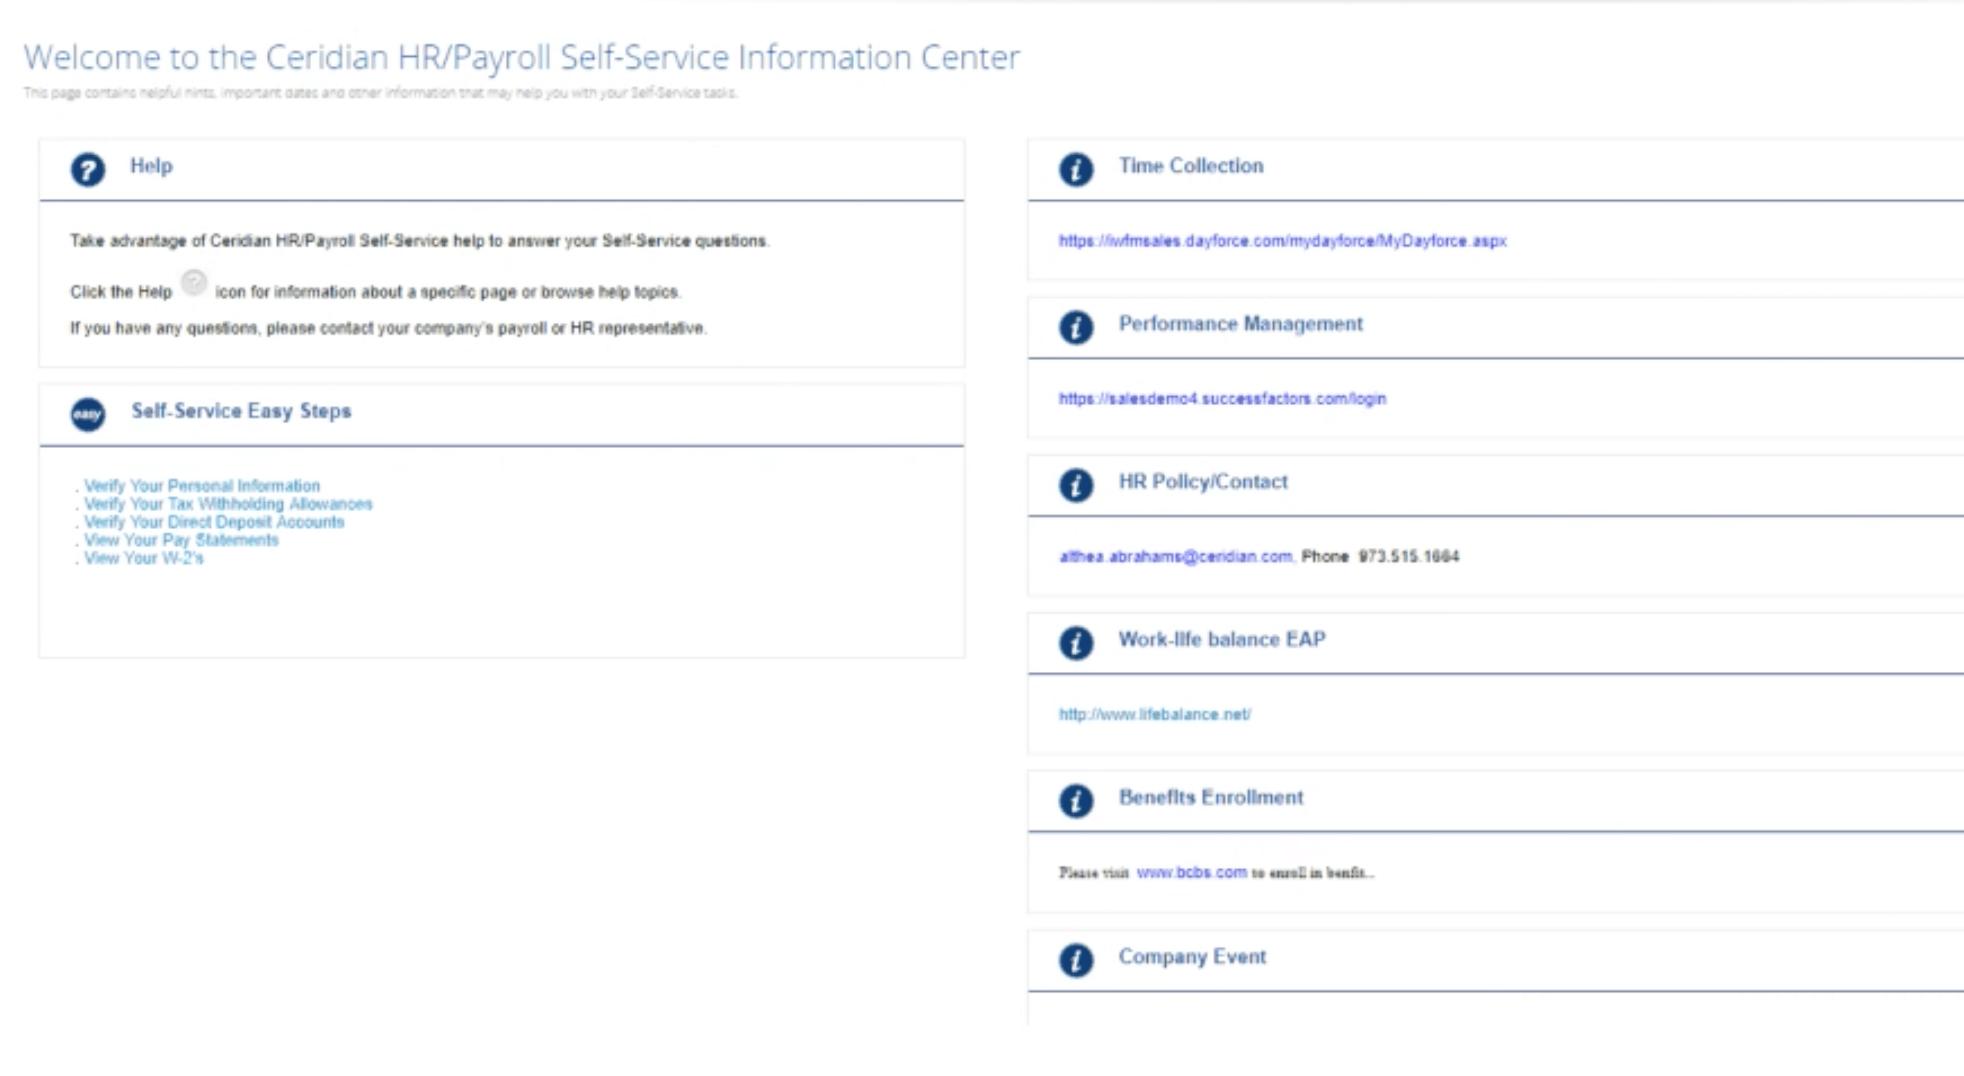 Ceridian HR Payroll employee service portal